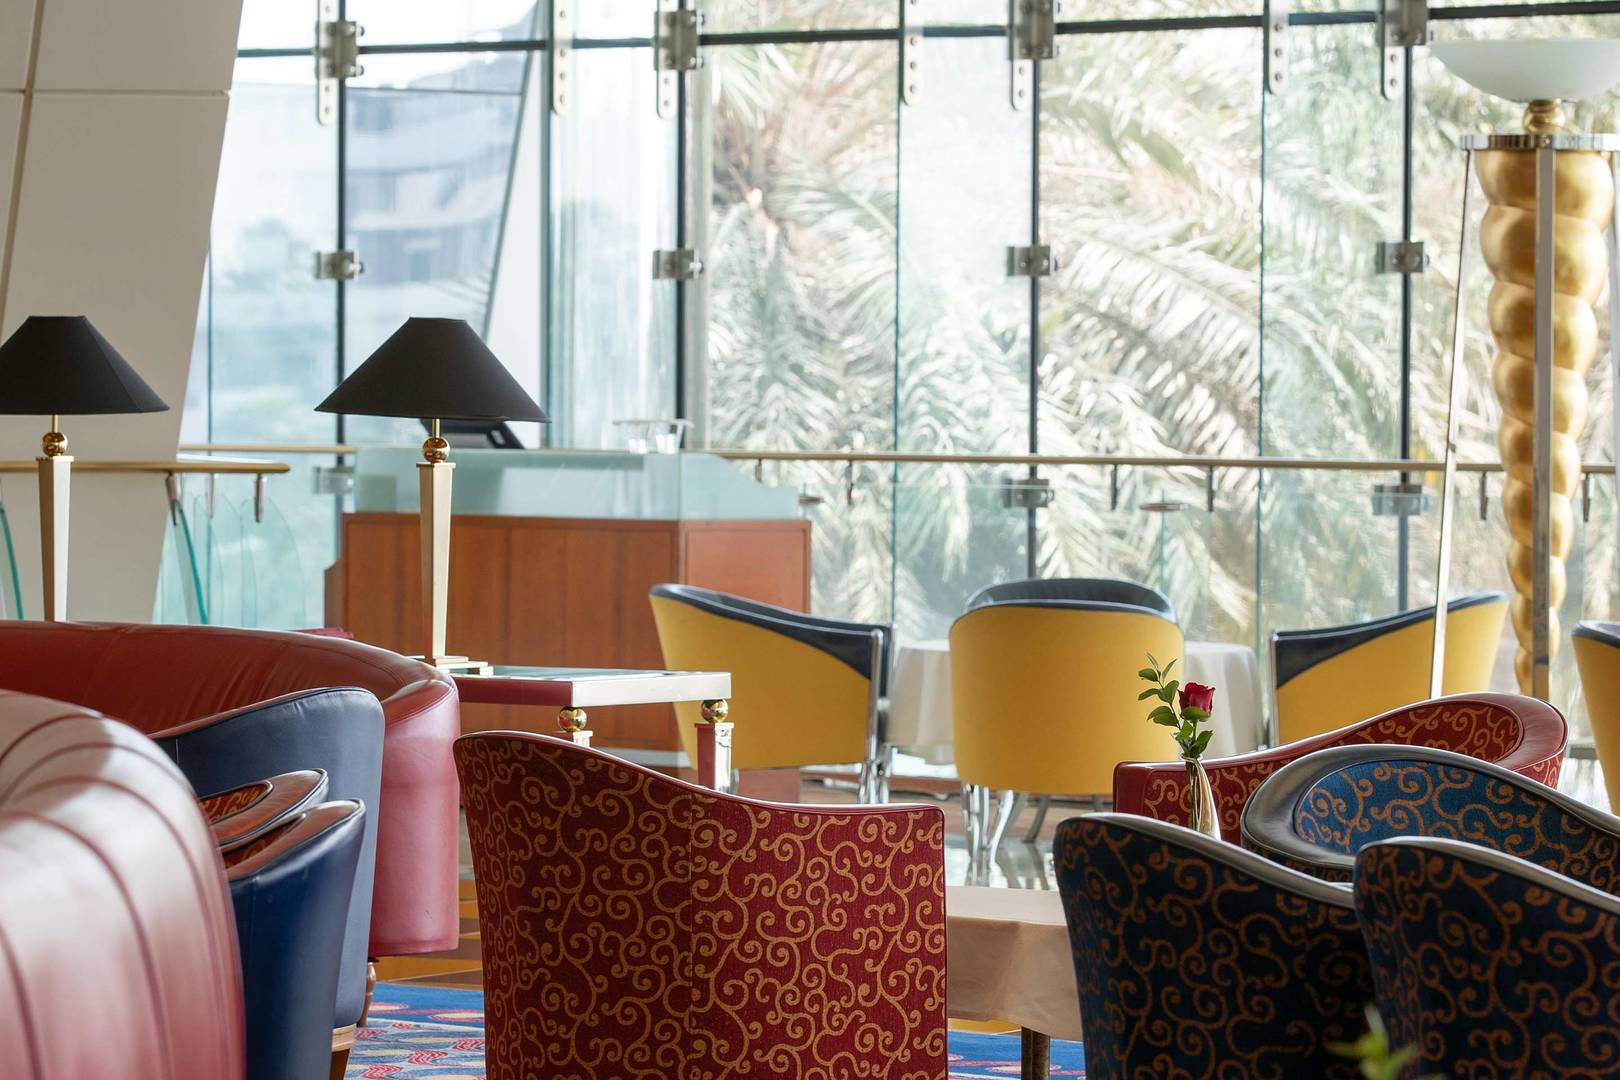 Interior of the Sahn Eddar Restaurant at Burj Al Arab